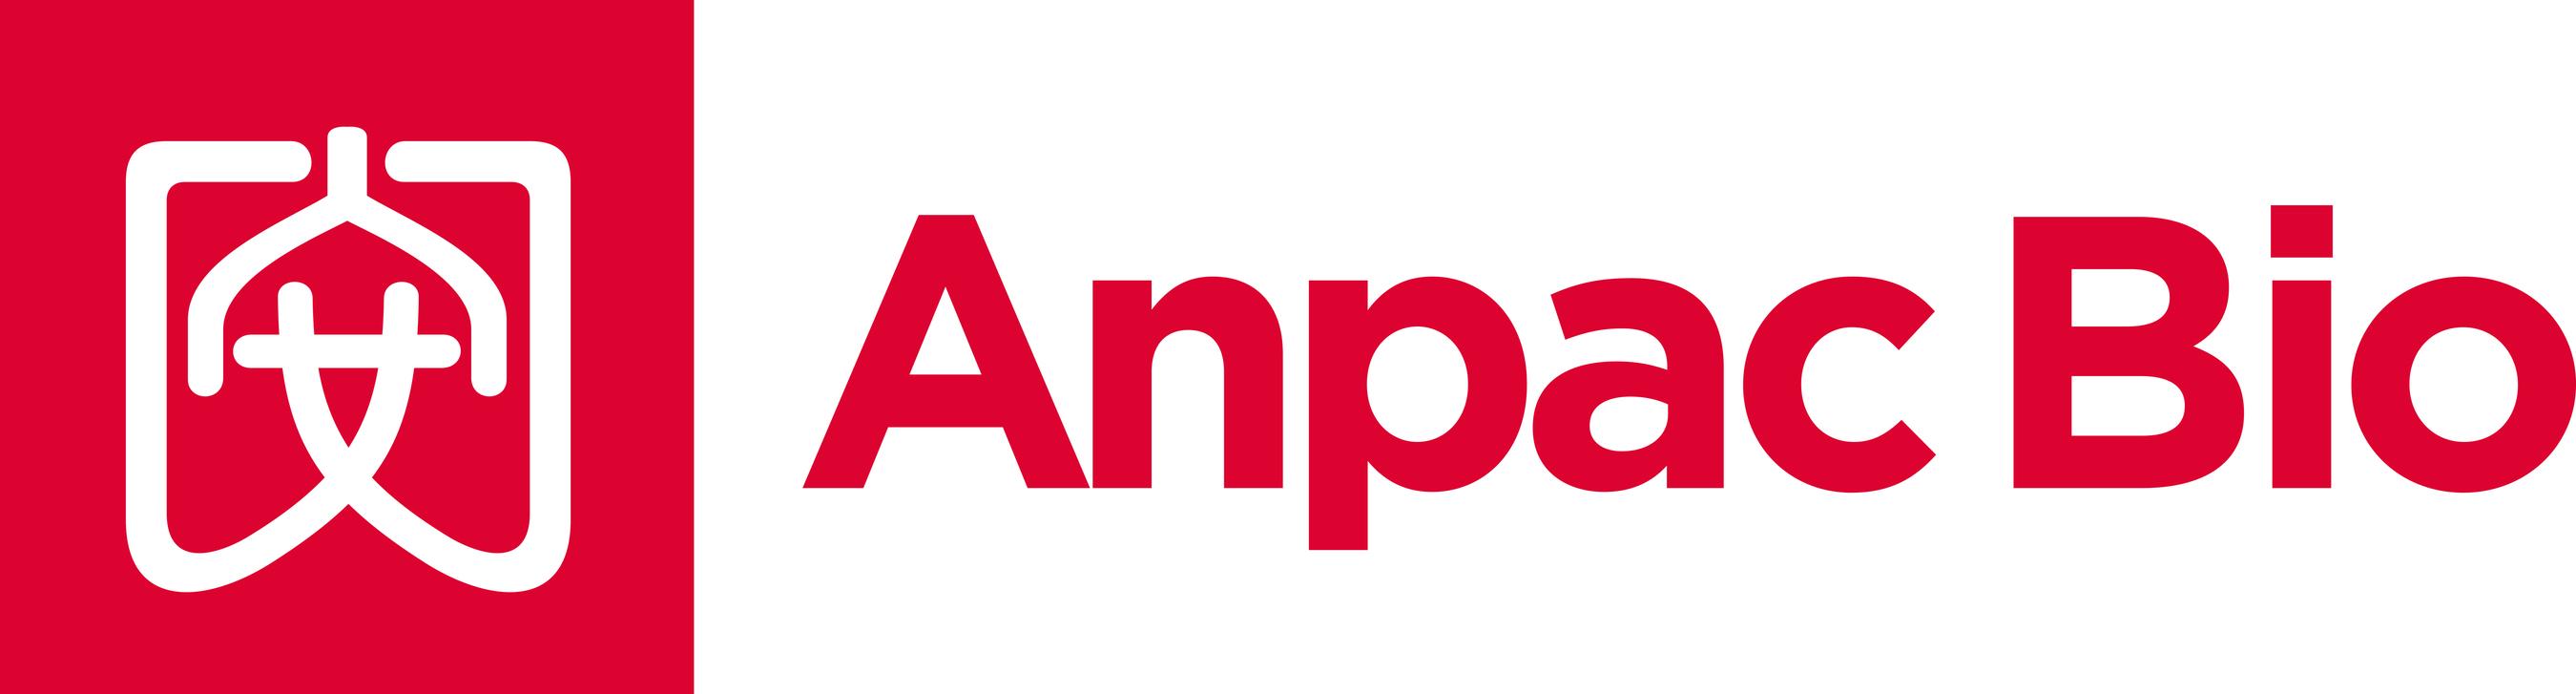 International life sciences leader Anpac Bio-Medical Science Company has developed breakthrough, proprietary, ...